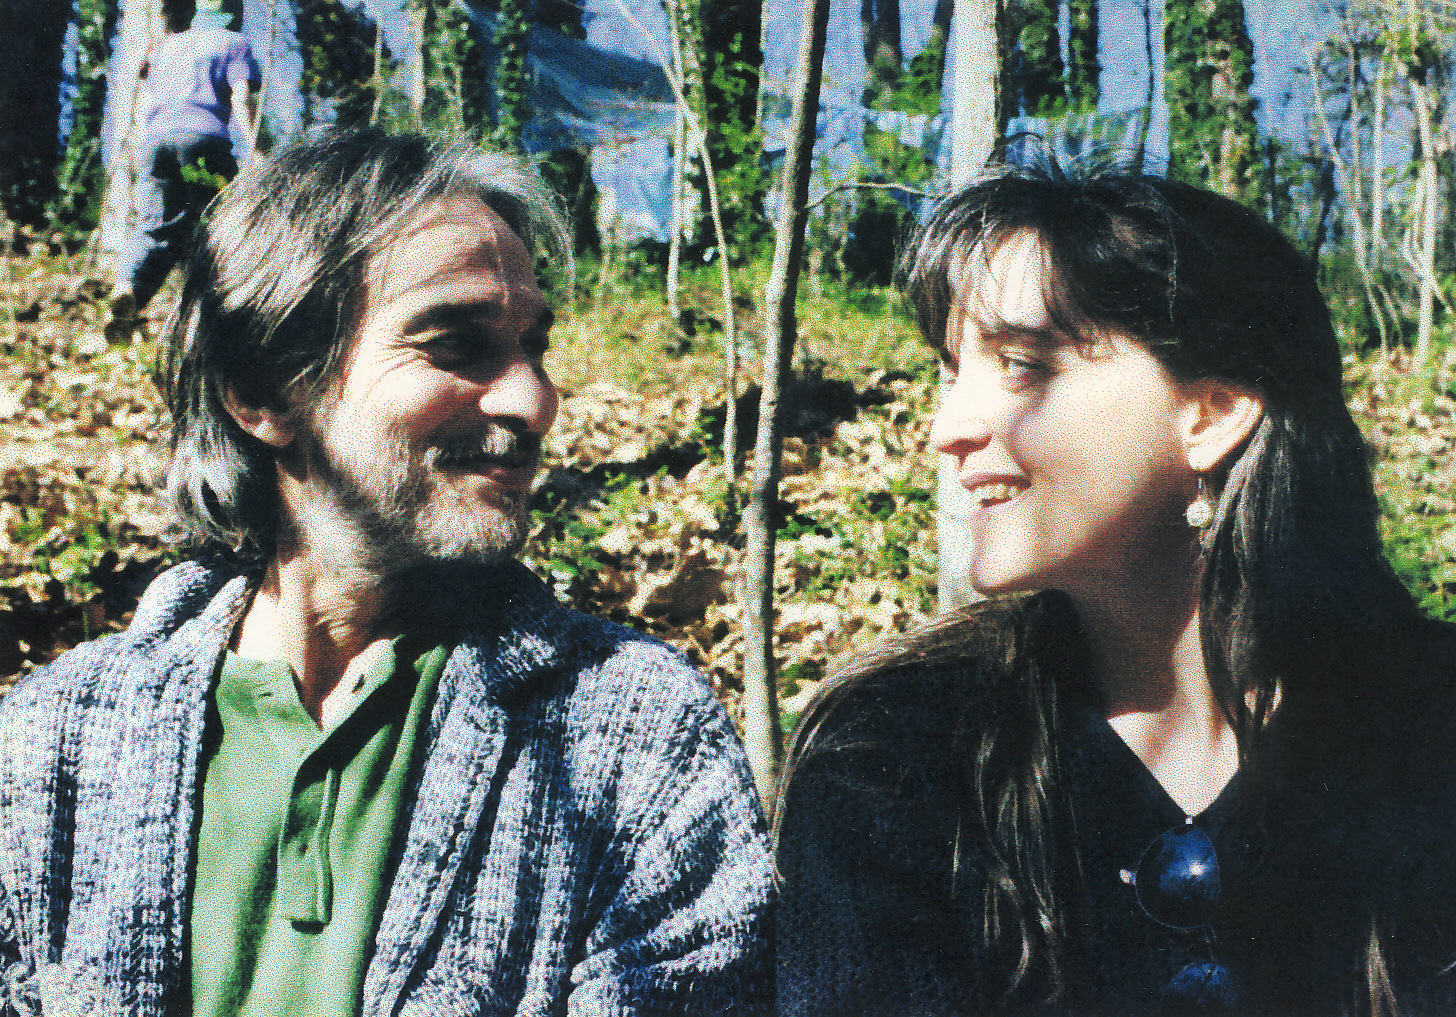 Eric and Jennifer